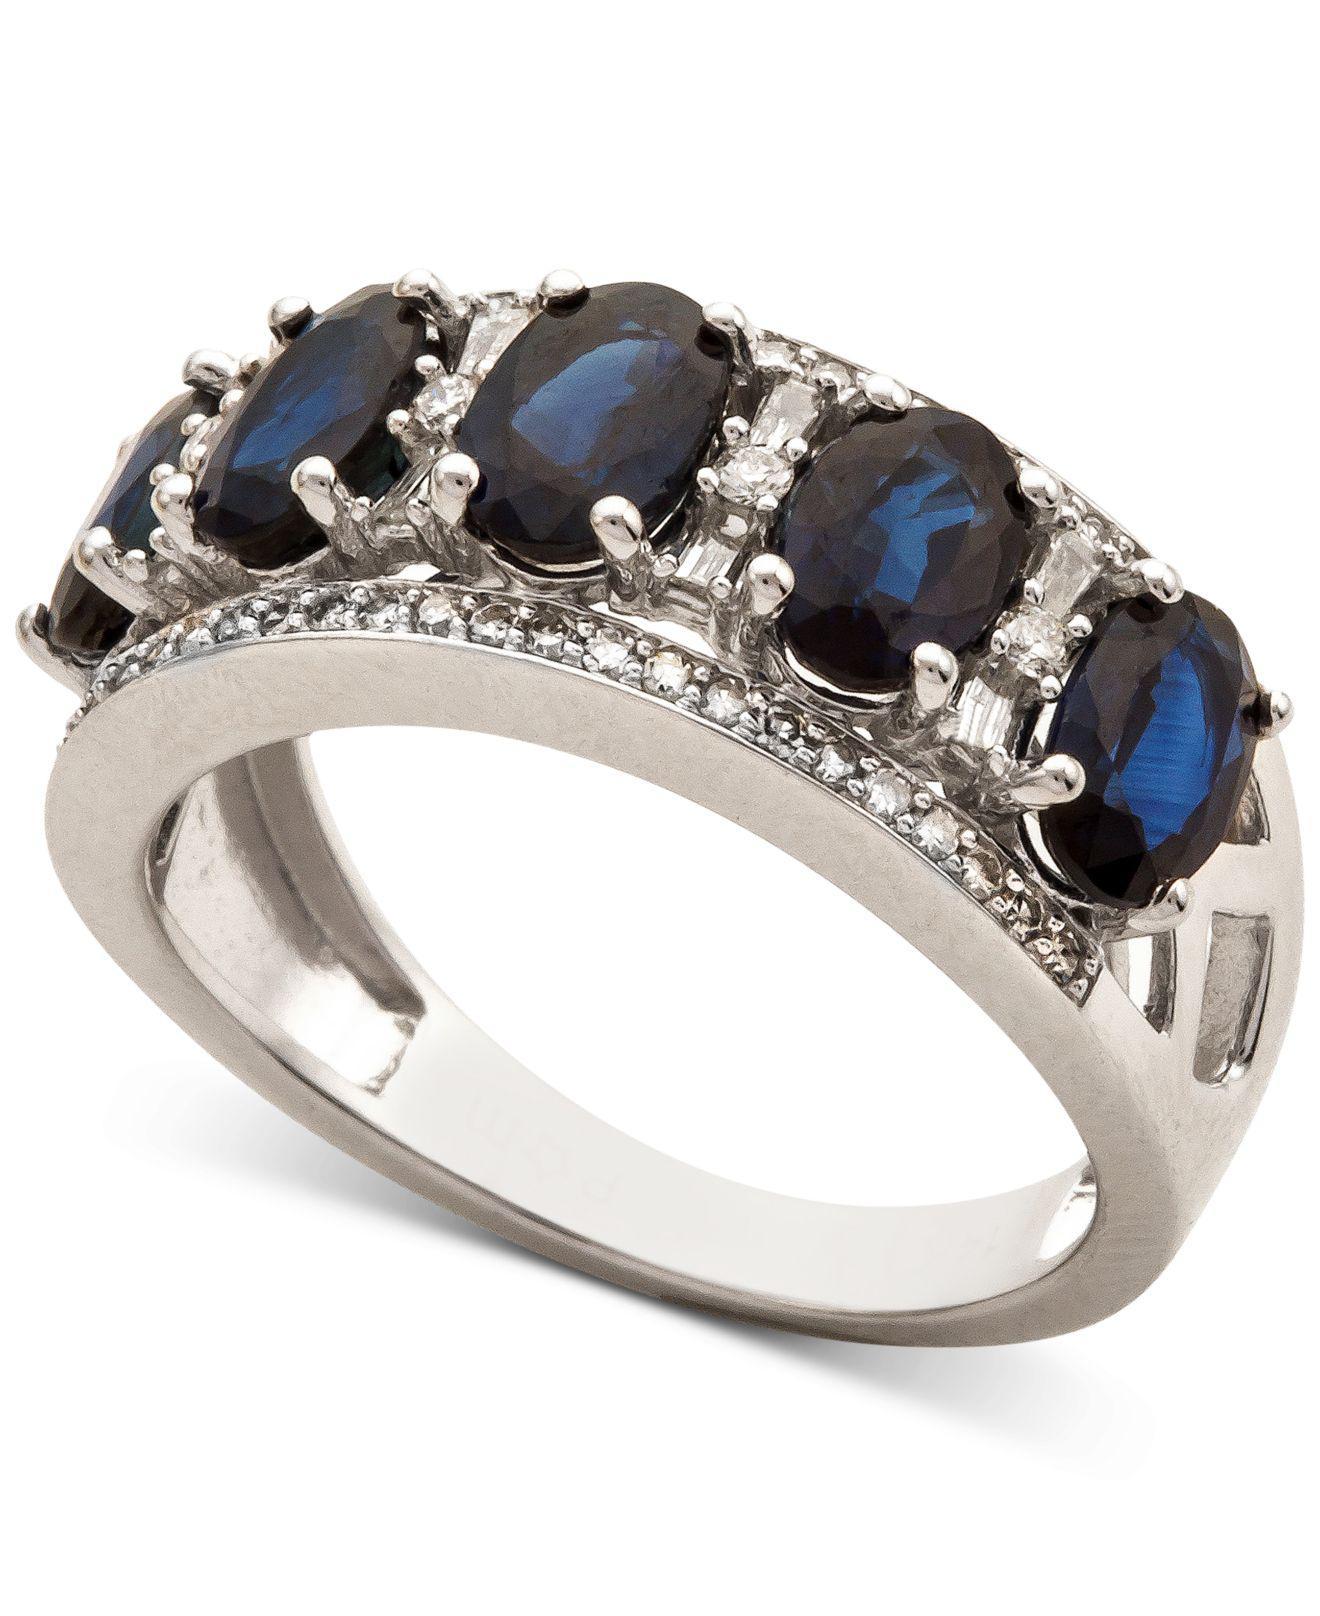 2346d9b8c Lyst - Macy's Sapphire (2-7/8 Ct. T.w.) & Diamond (1/3 Ct. T.w. ...